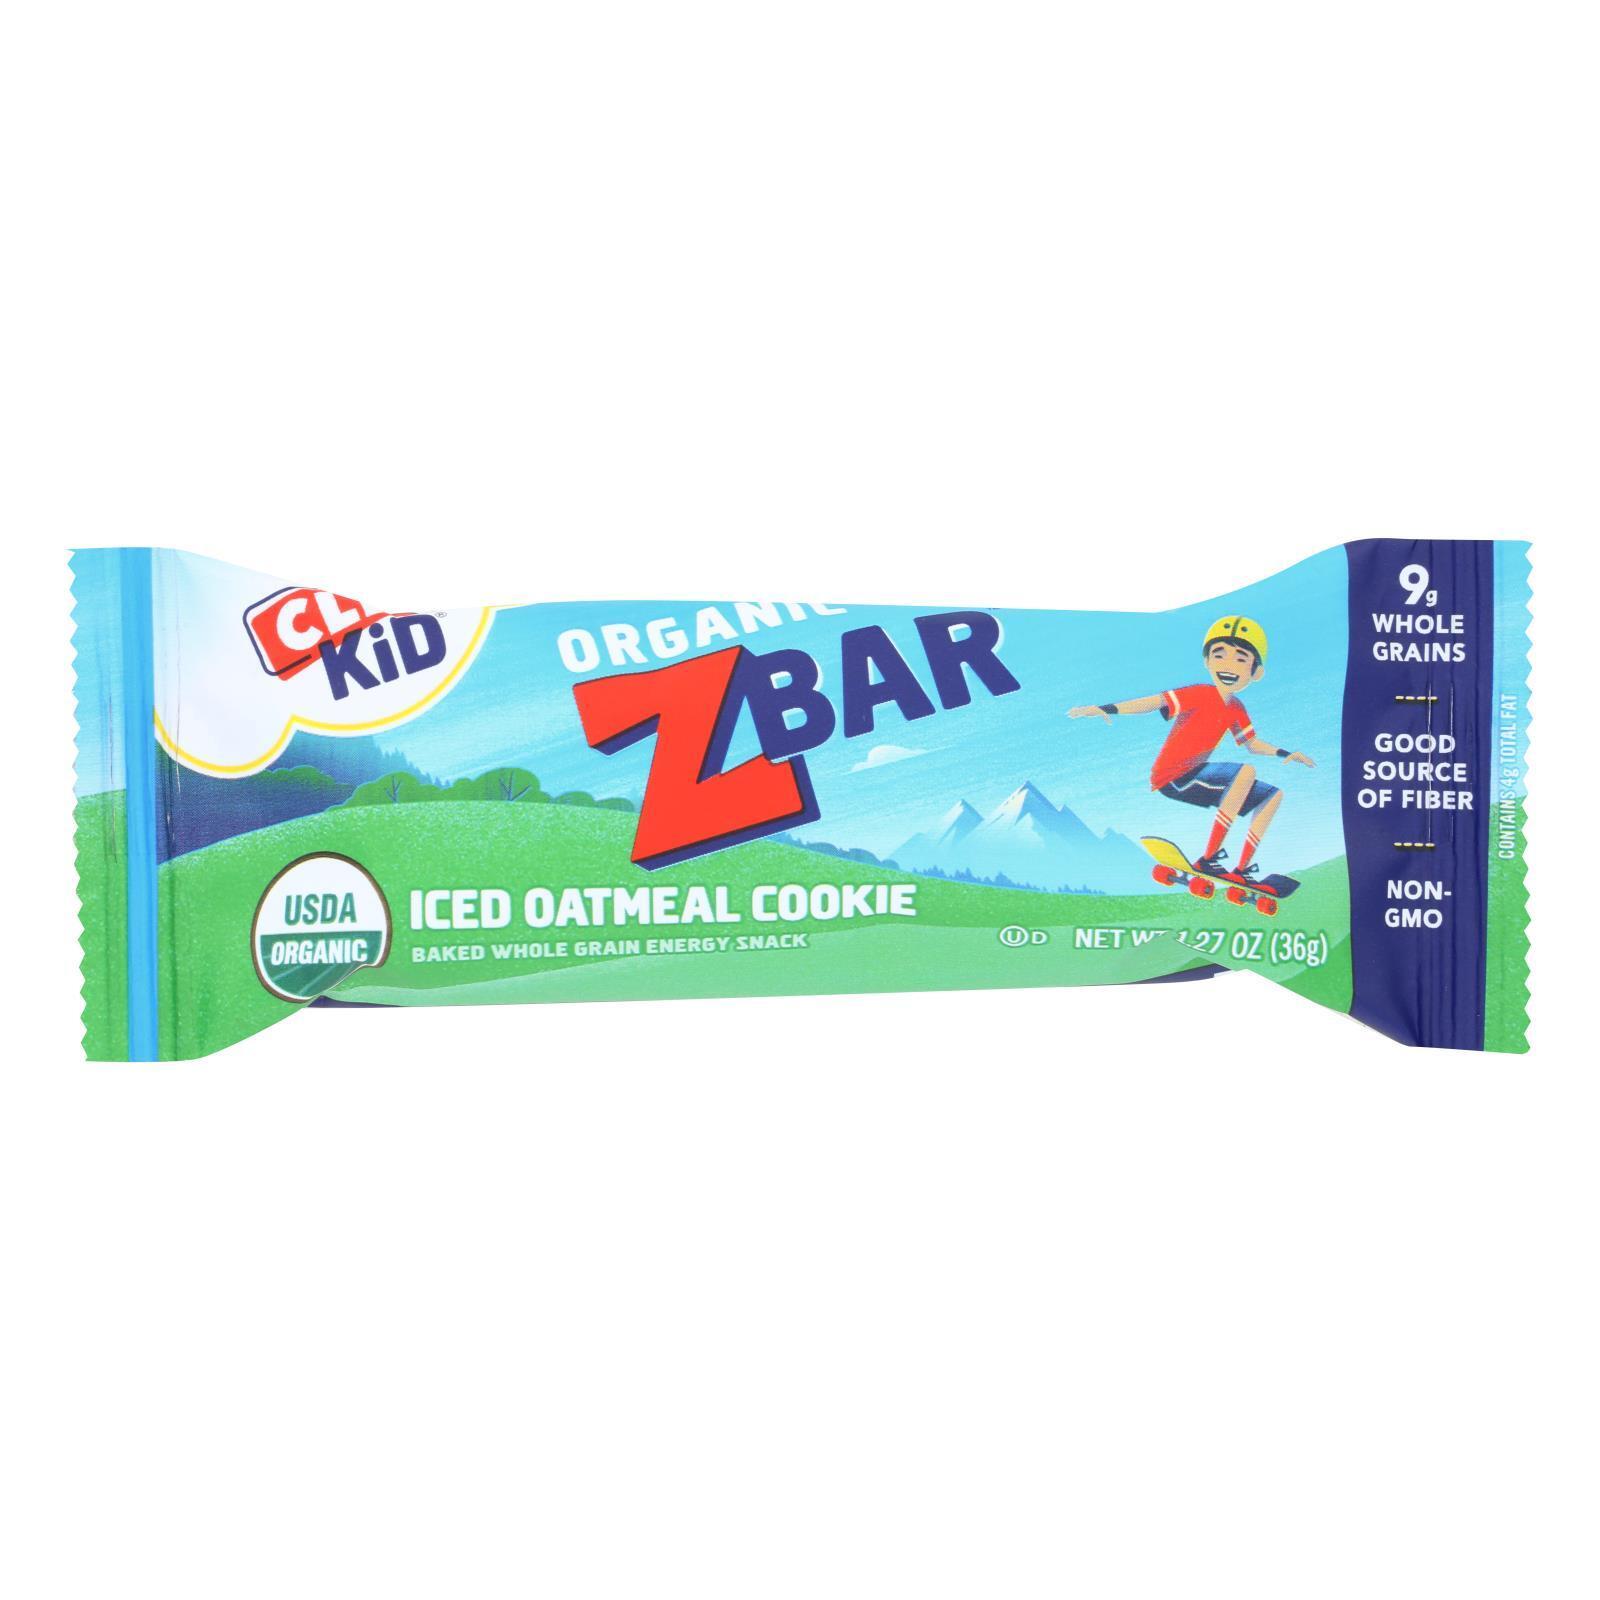 Clif Bar Organic Clif Kid Zbar - Iced Oatmeal Cookie - Case of 18 - 1.27 oz Bars